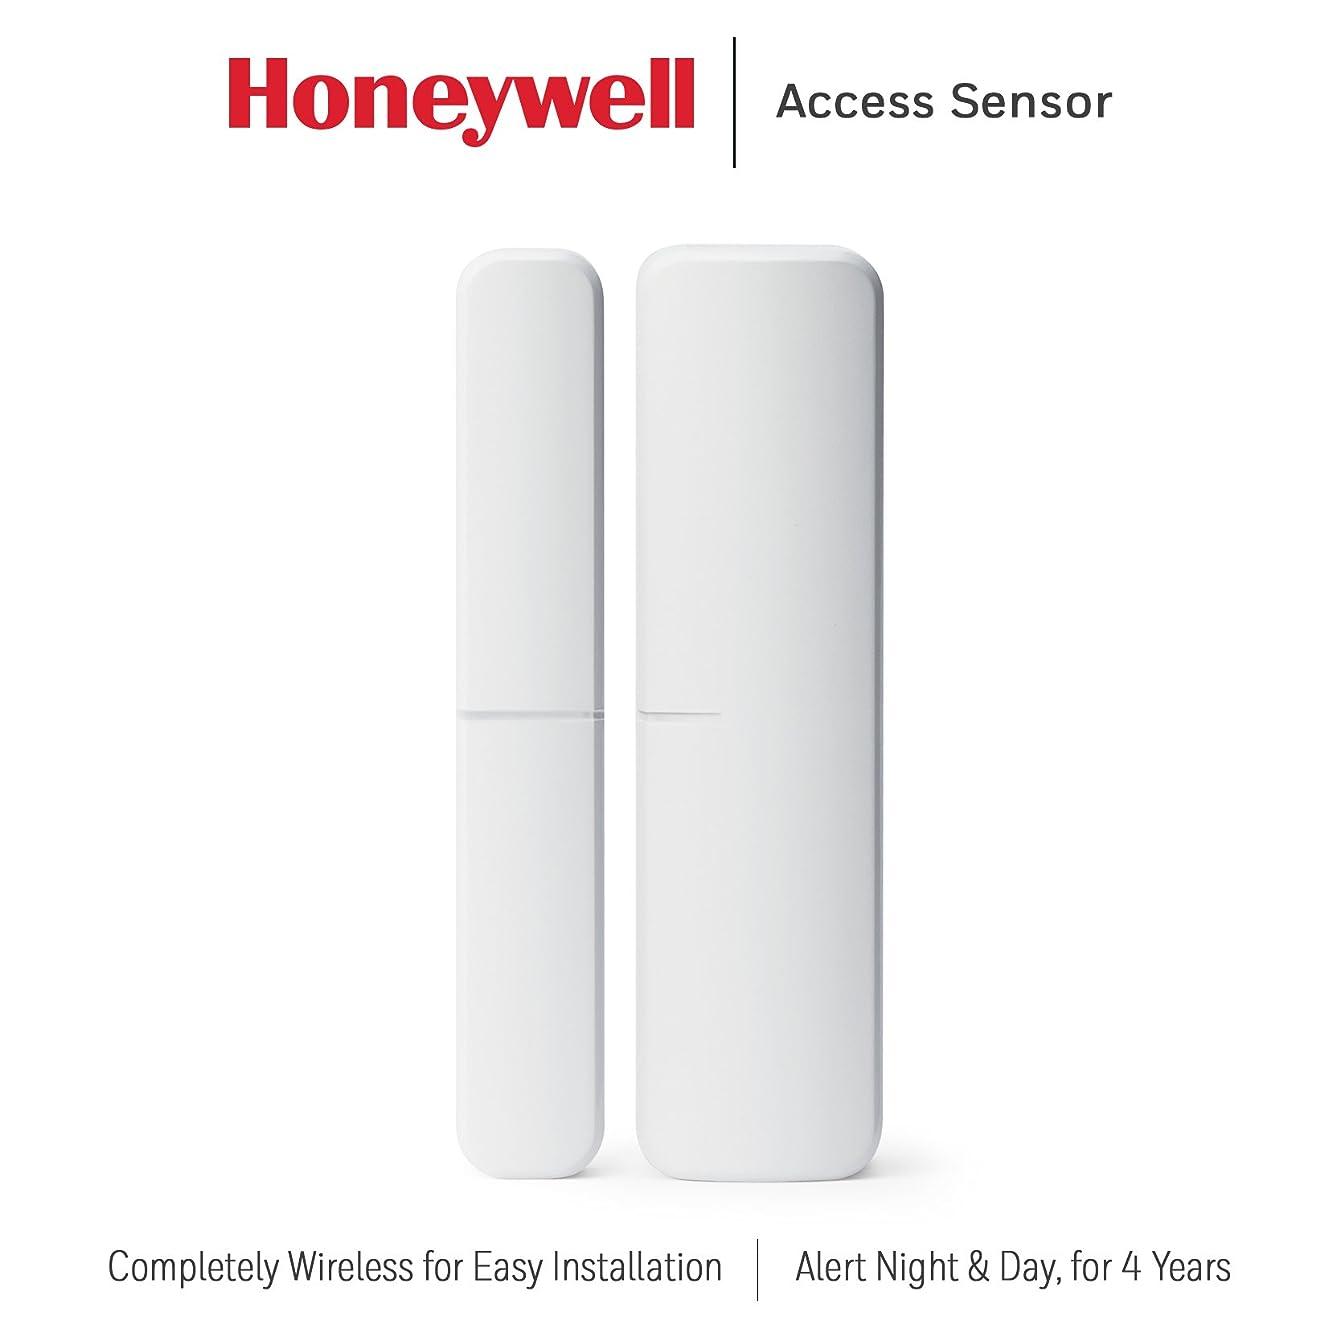 Honeywell RCHSWDS1 Smart Home Security Access Sensor for Windows & Doors, White